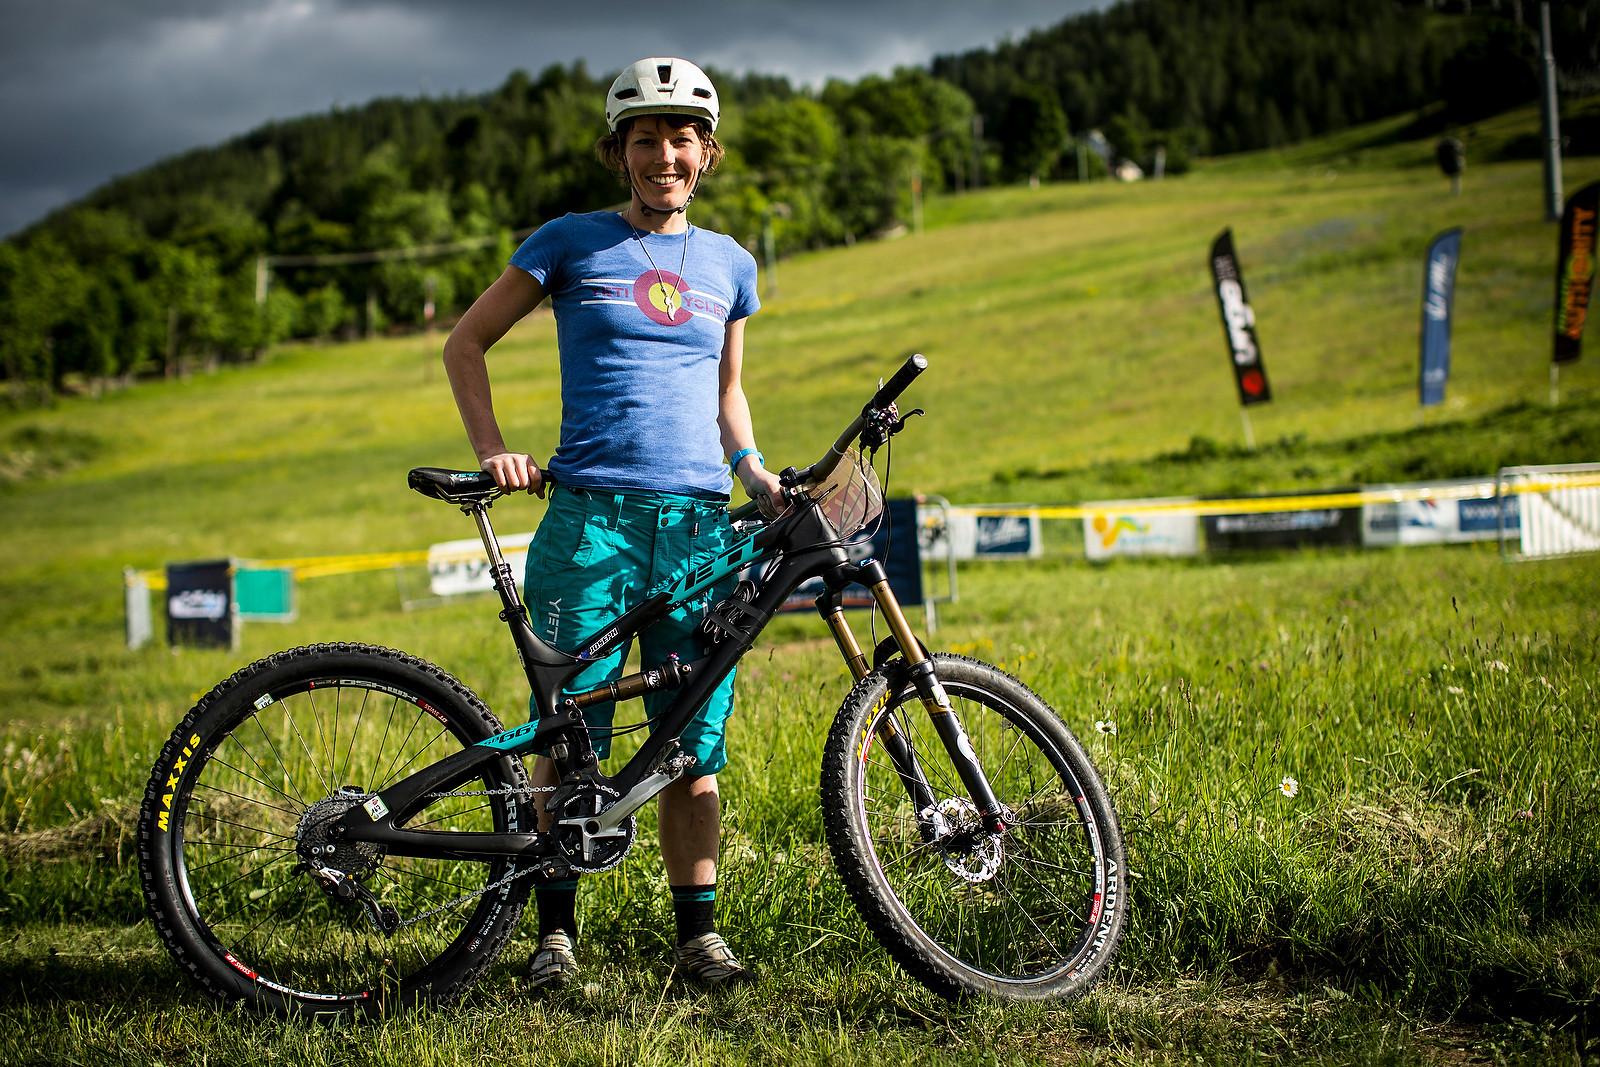 Rosara Joseph with her Yeti SB66c at Val d'Allos Enduor World Series - Pit Bits: Enduro World Series Val d'Allos, France - Mountain Biking Pictures - Vital MTB